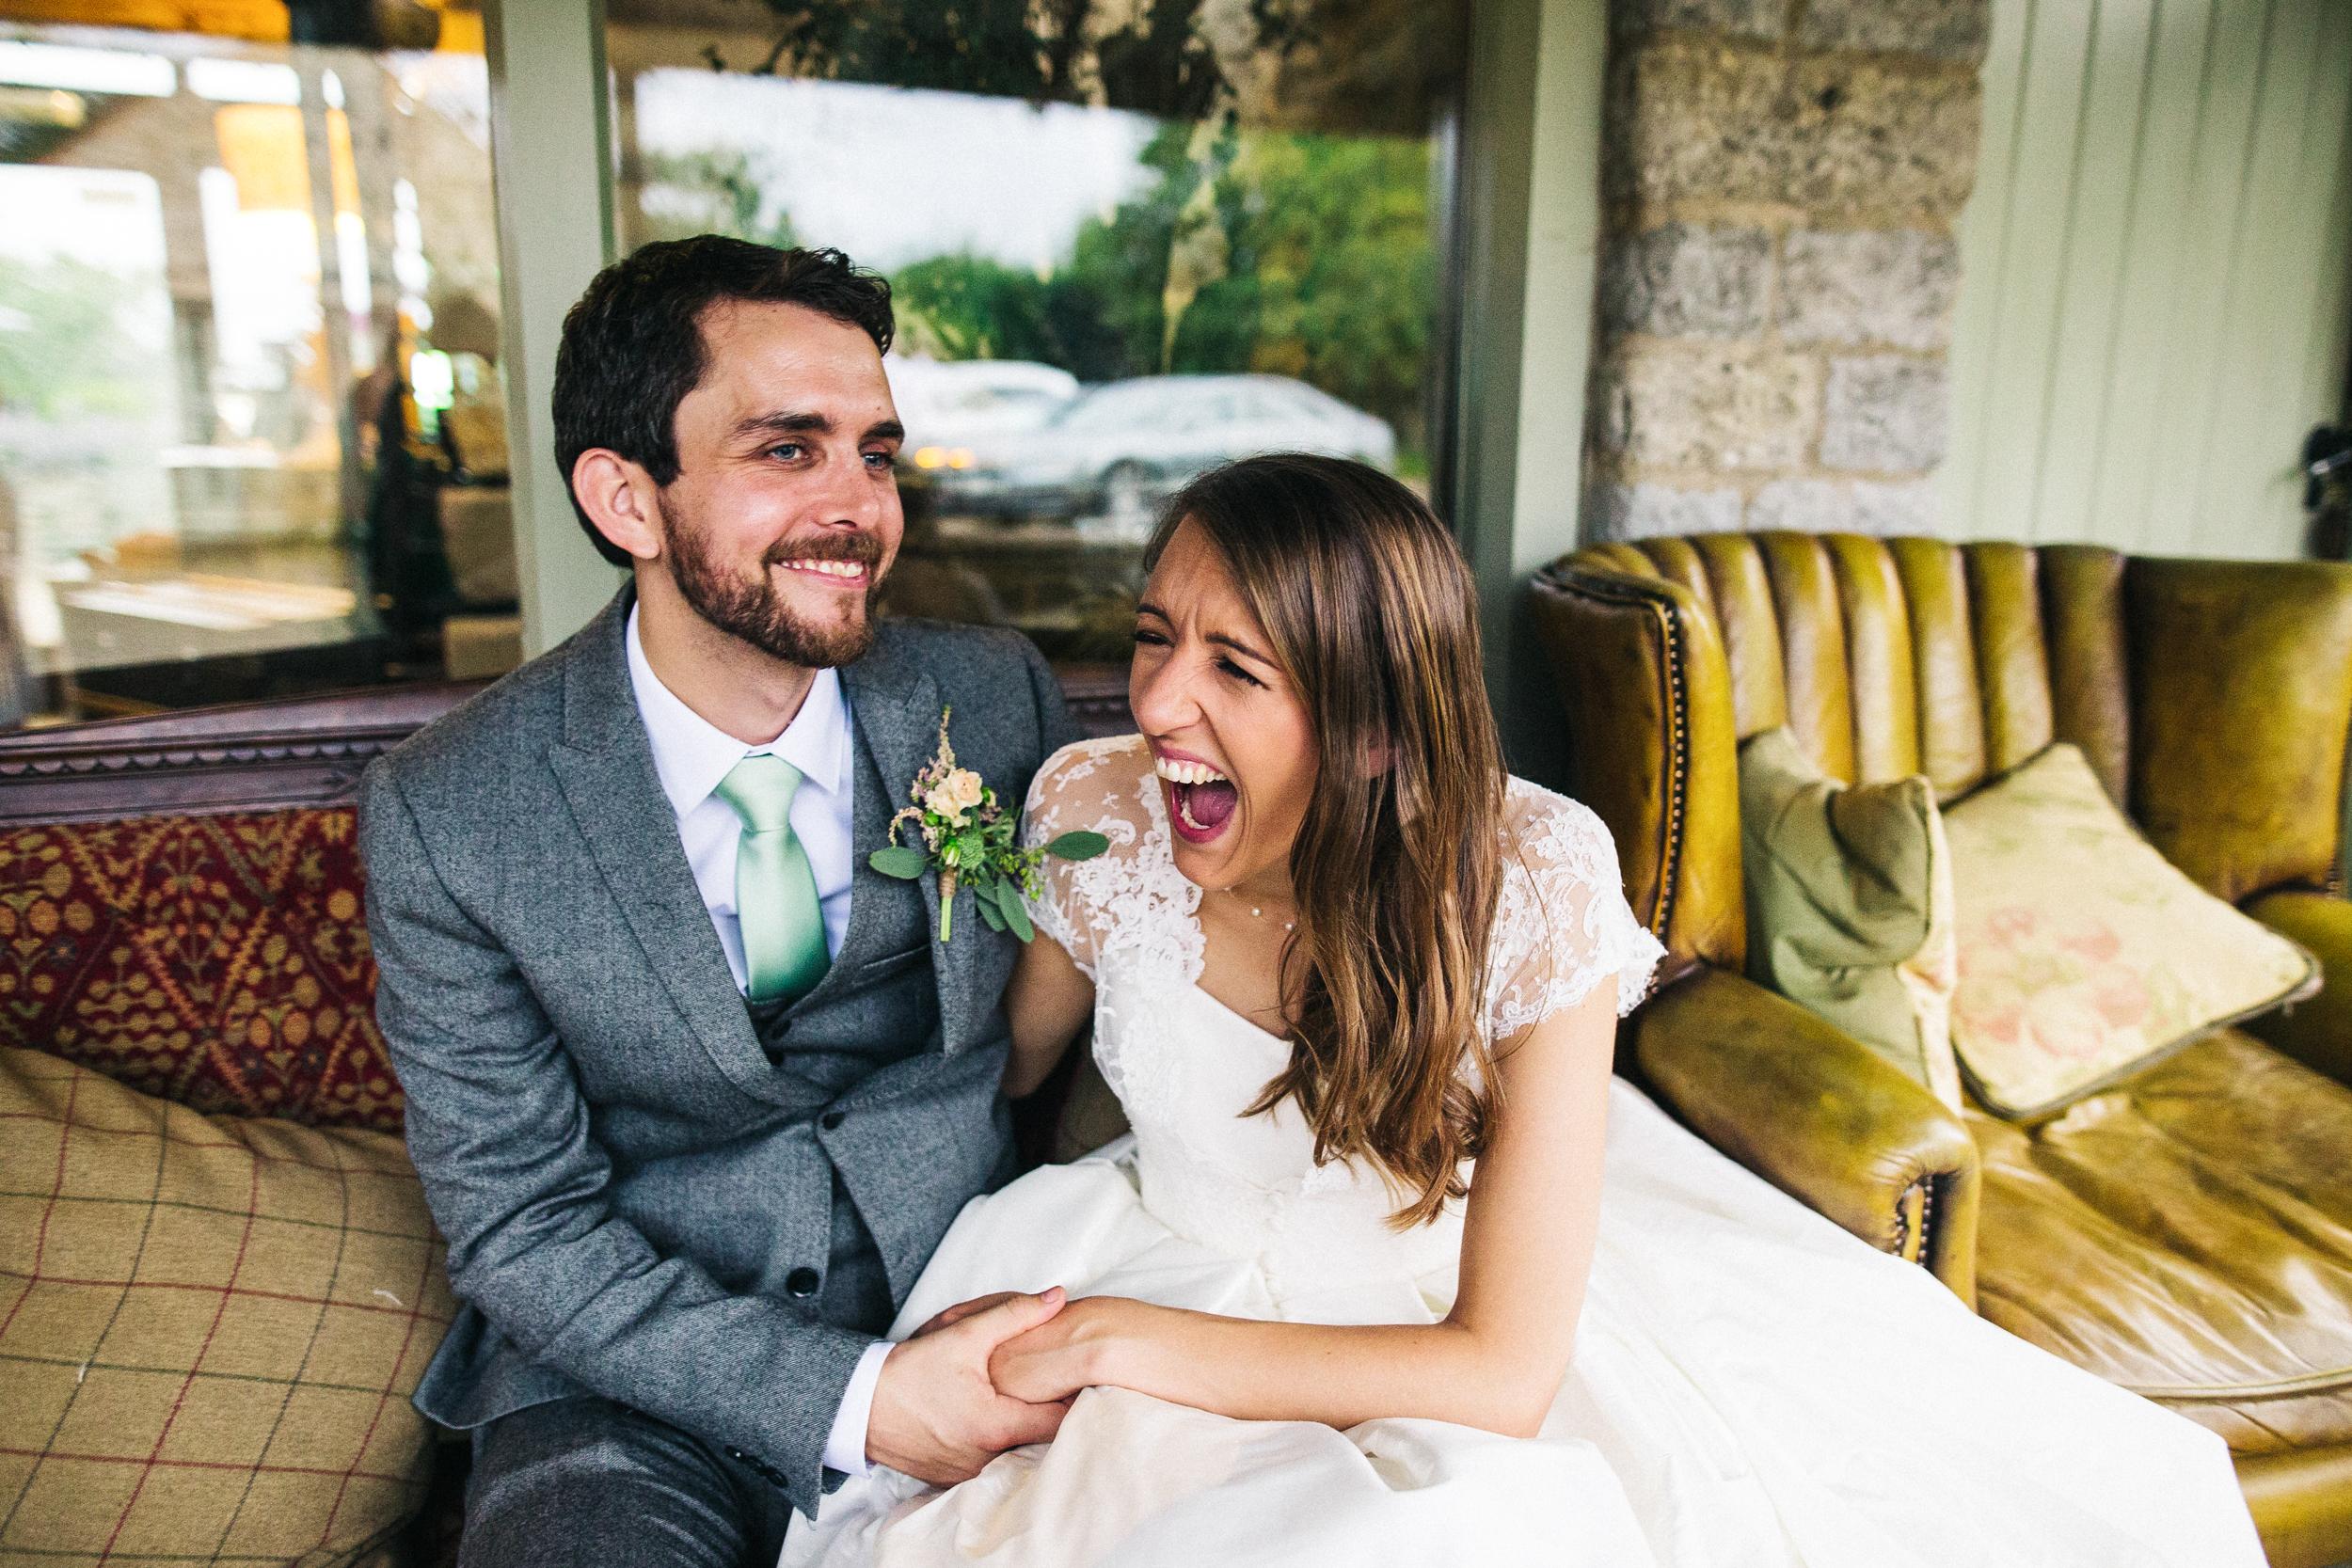 creative-wedding-photography-teesside-north-east-yorkshire-55.jpg